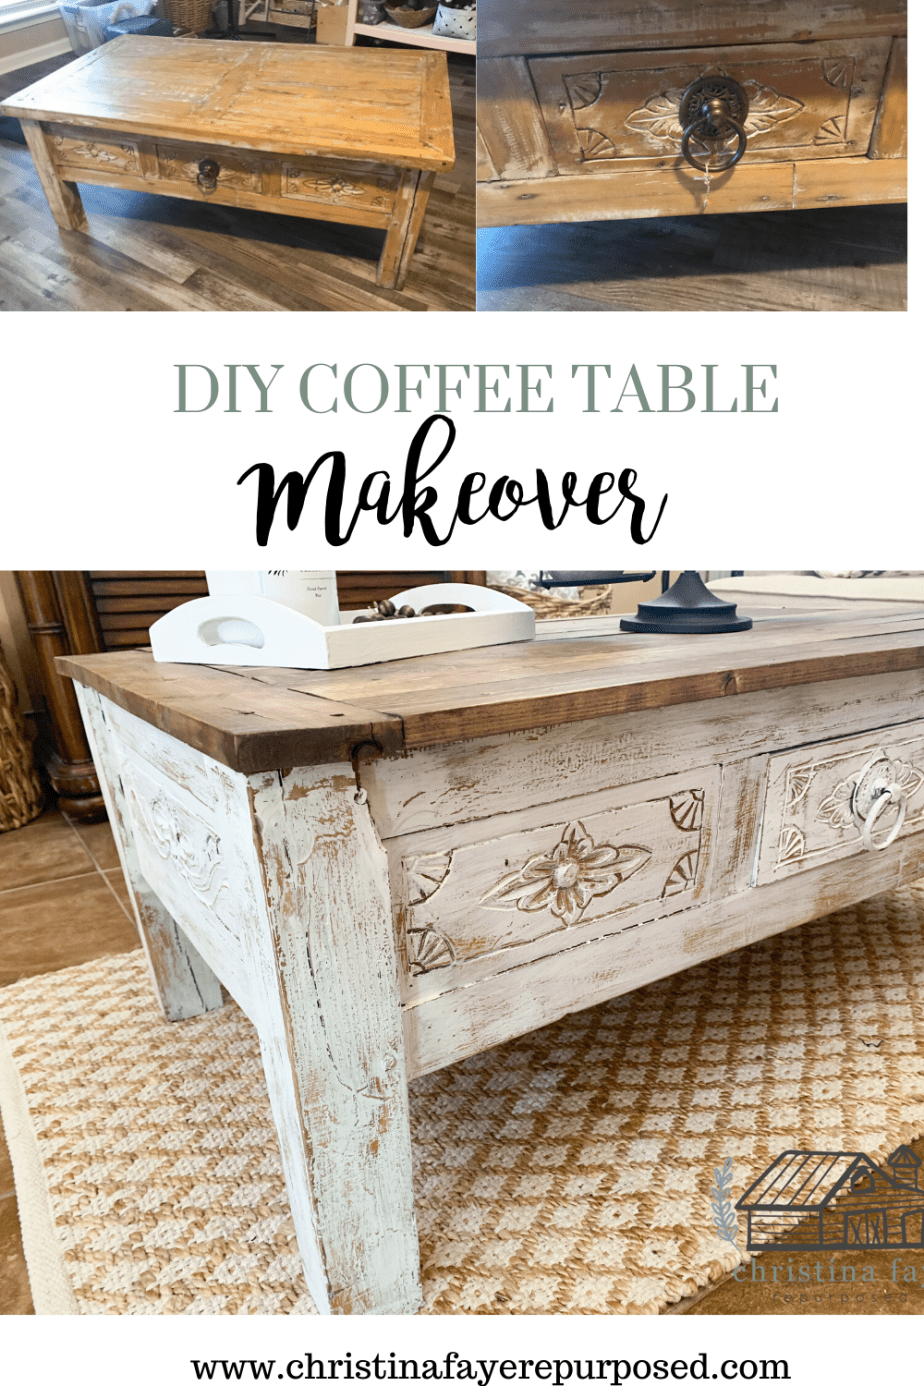 Diy Coffee Table Makeover Coffee Table Makeover Diy Coffee Table Table Makeover [ 1386 x 924 Pixel ]